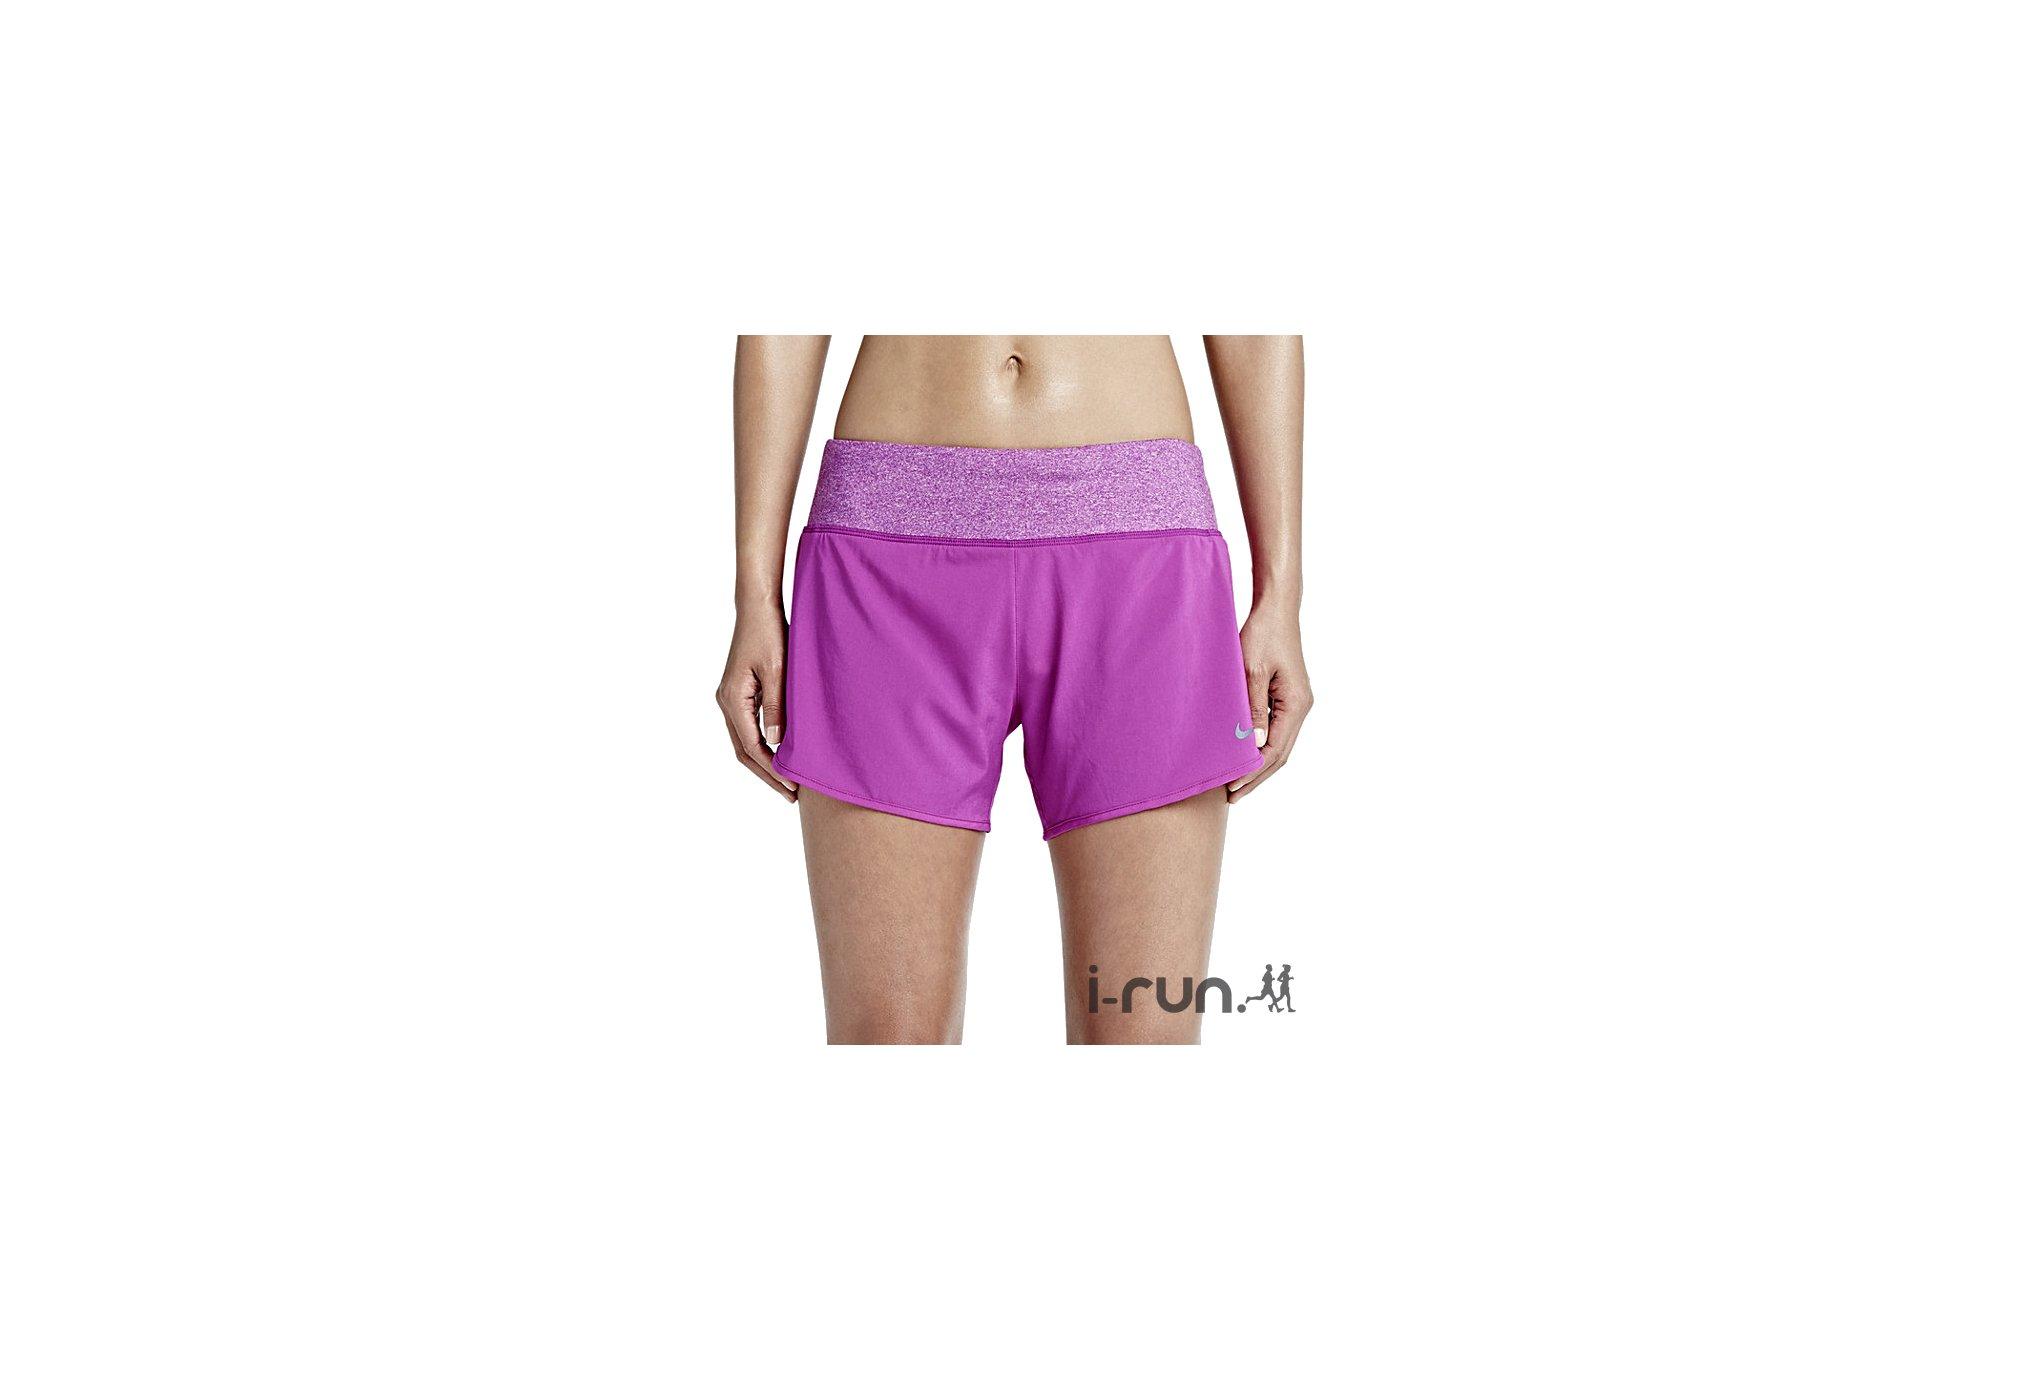 Nike short rival 10cm w pas cher destockage nike running short rival 10cm w - Avis destockage fitness ...